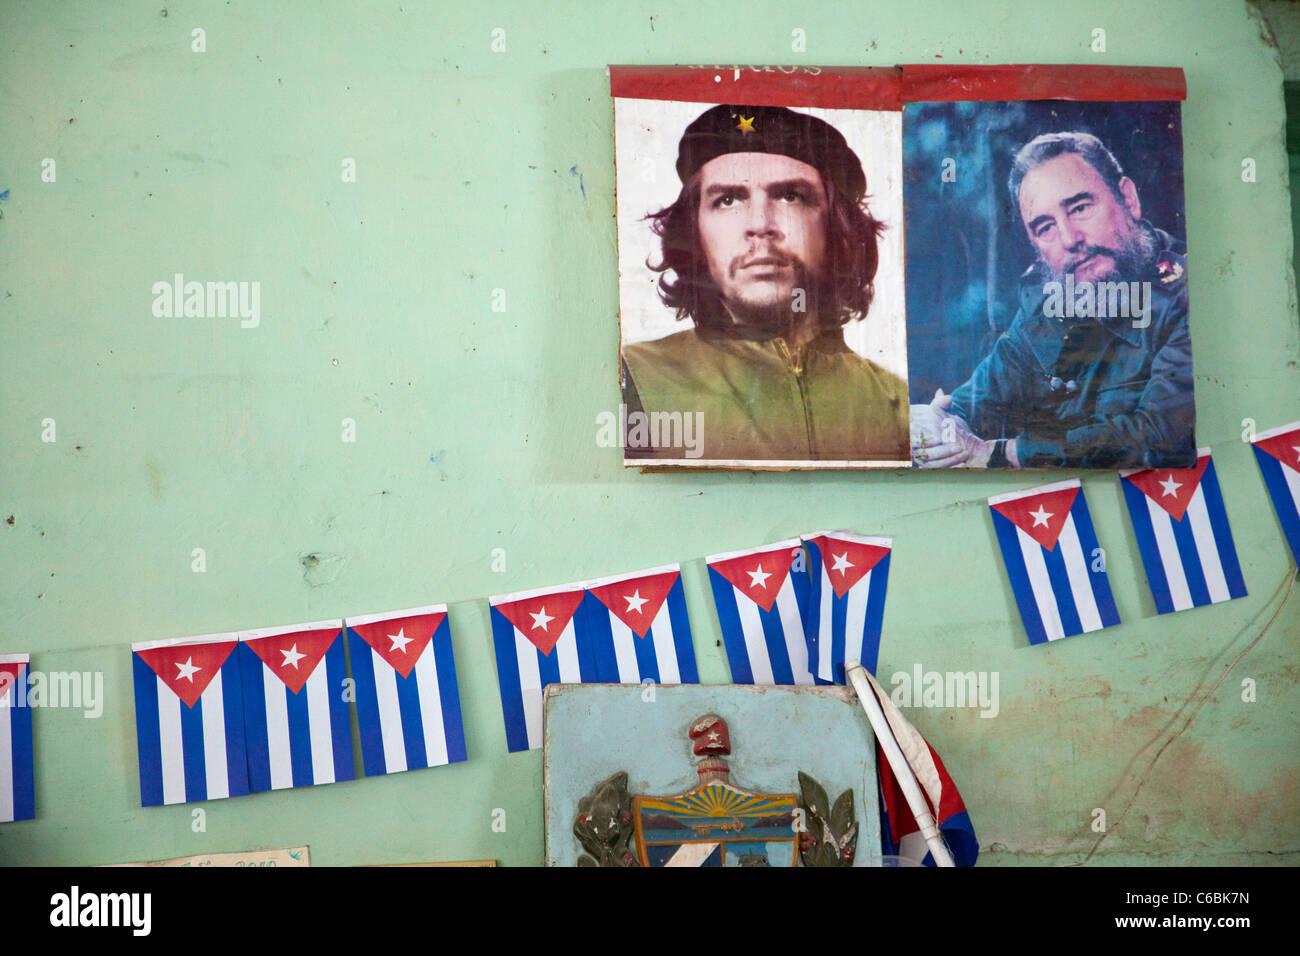 Cuba, Havana. Leaders of the Revolution, Che Guevara and Fidel Castro. Wall Decoration inside a Store. Stock Photo